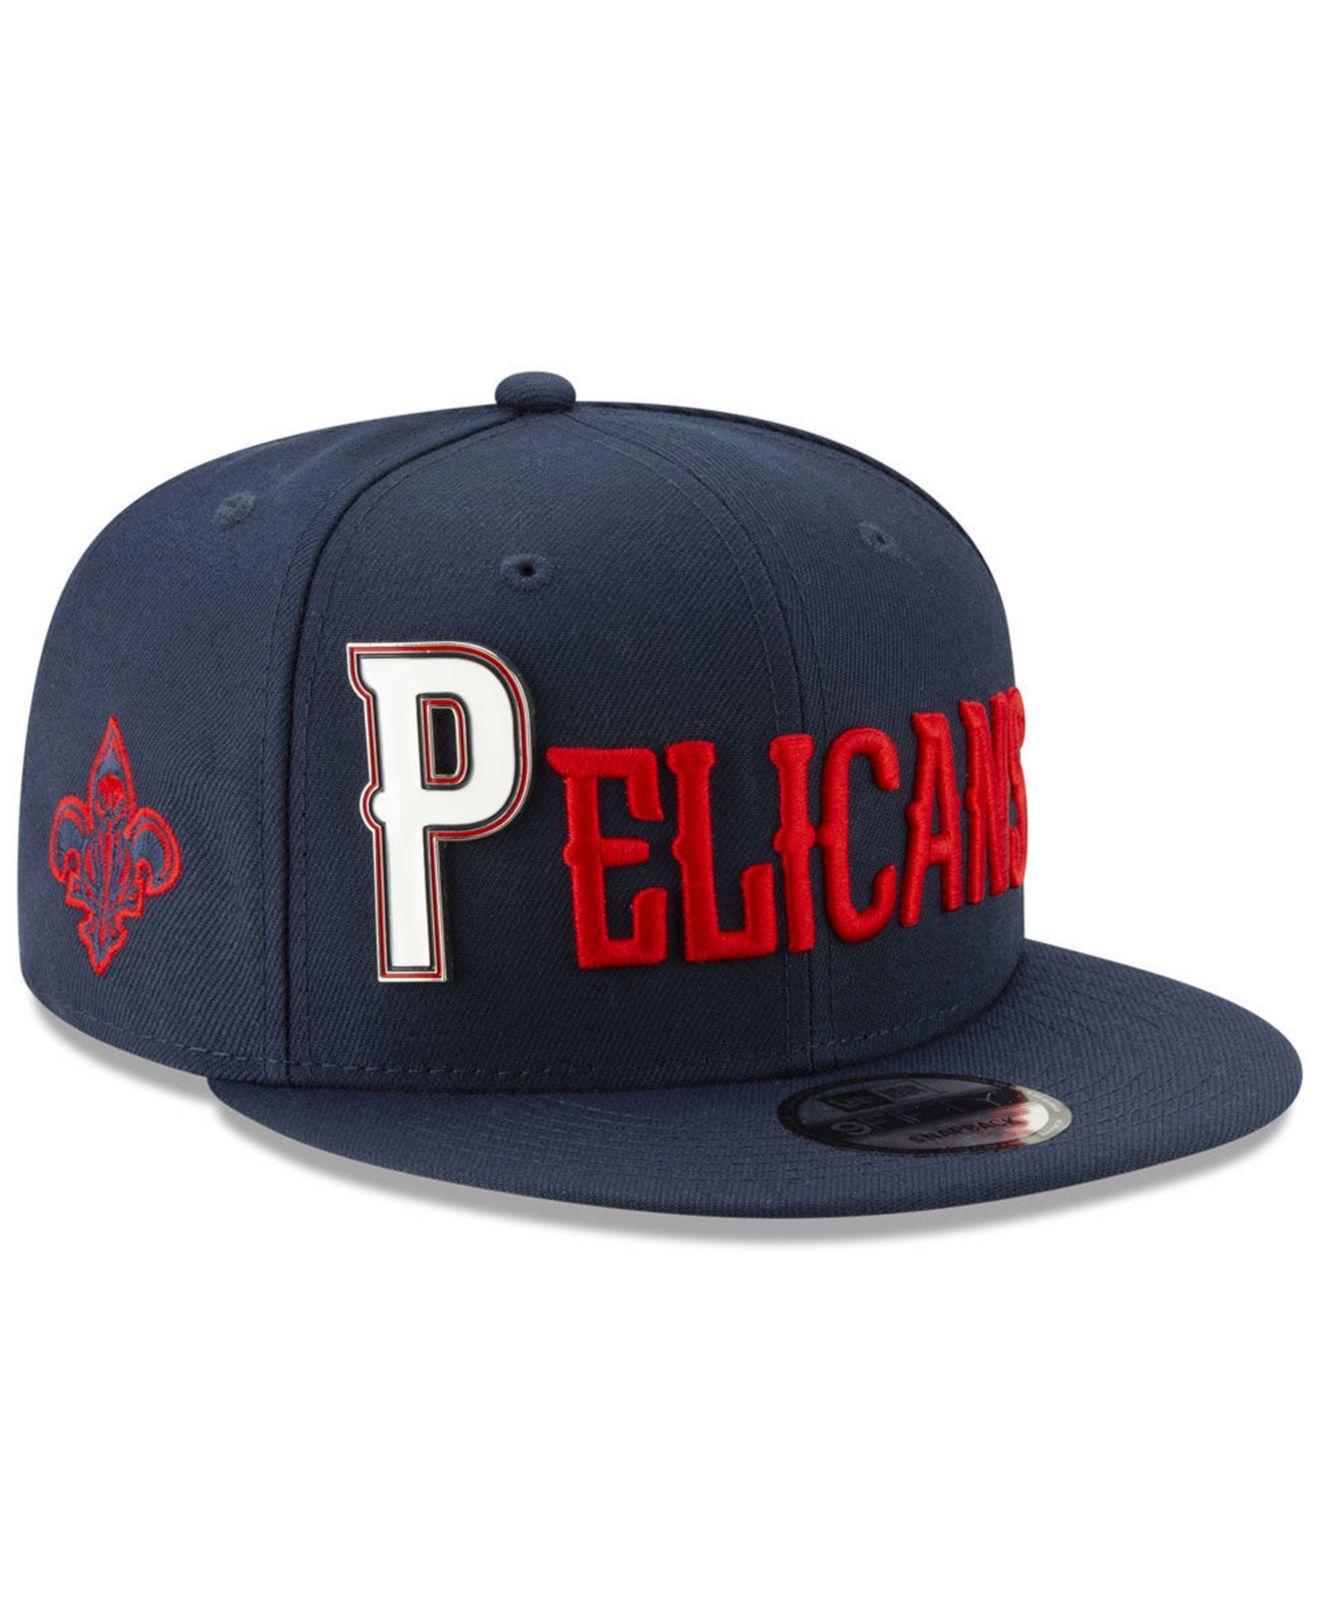 Lyst - KTZ New Orleans Pelicans Enamel Script 9fifty Snapback Cap in ... 272597e987cc